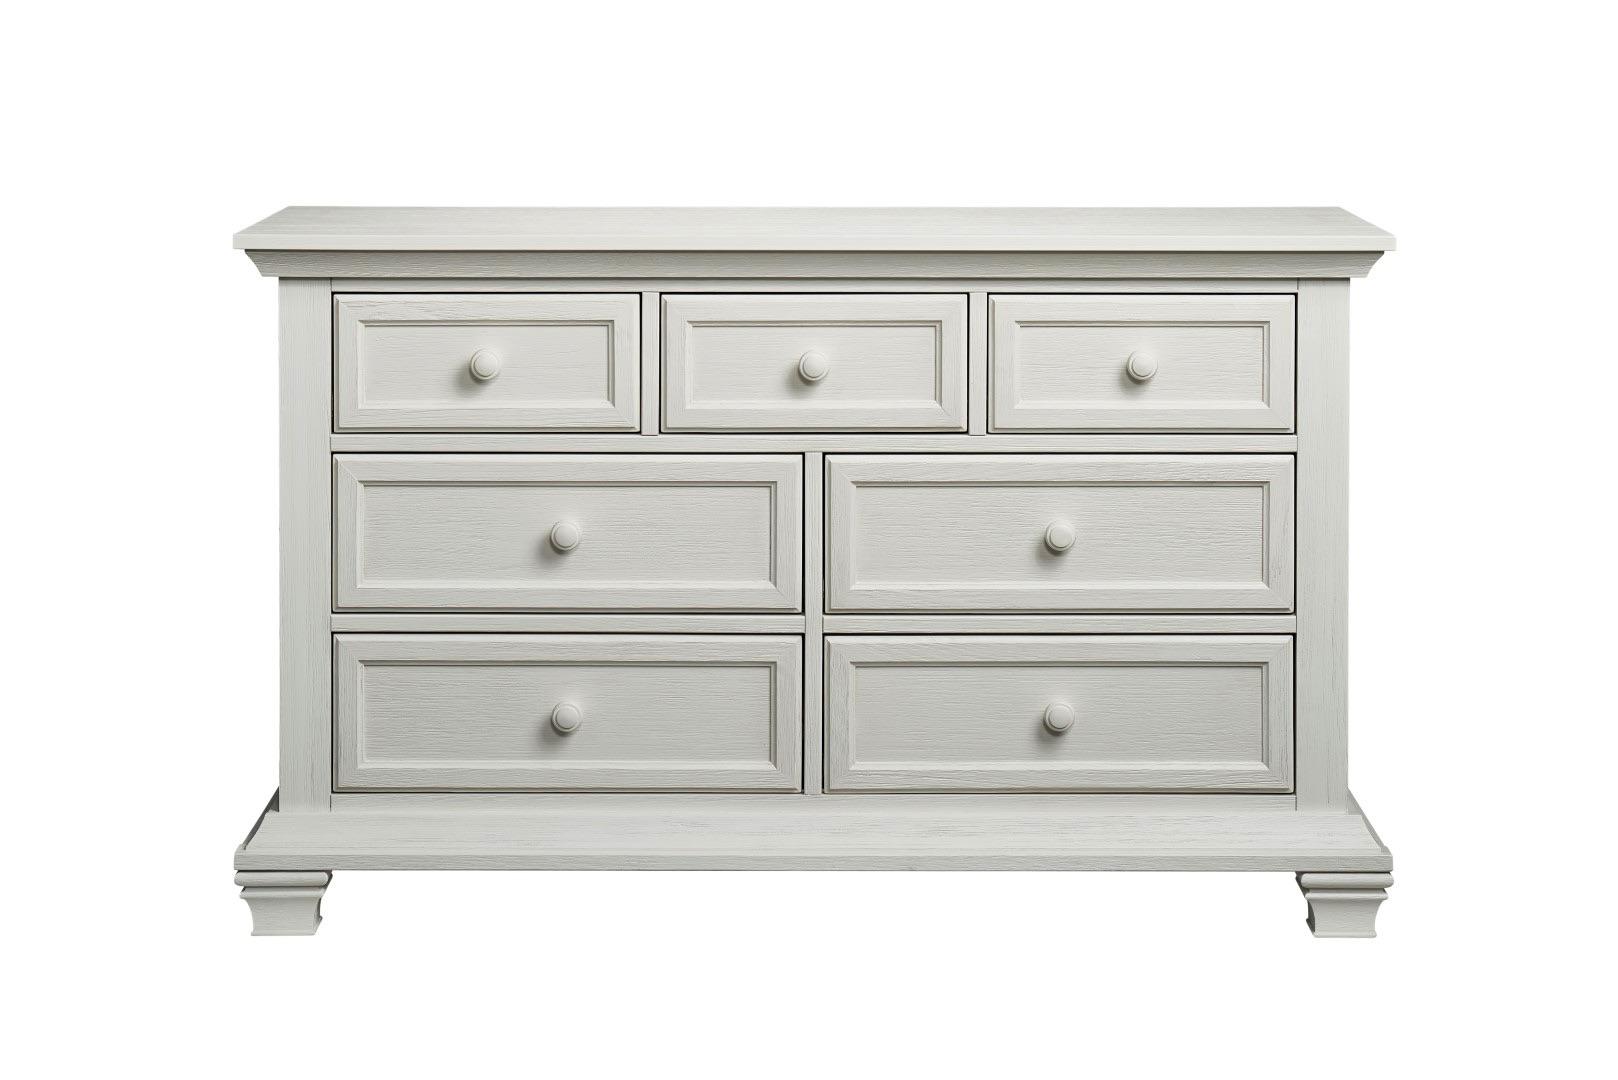 One Guard Warranty >> 7 Drawer Dresser - Cottage Cove Vintage White | Oxford Baby & Kids